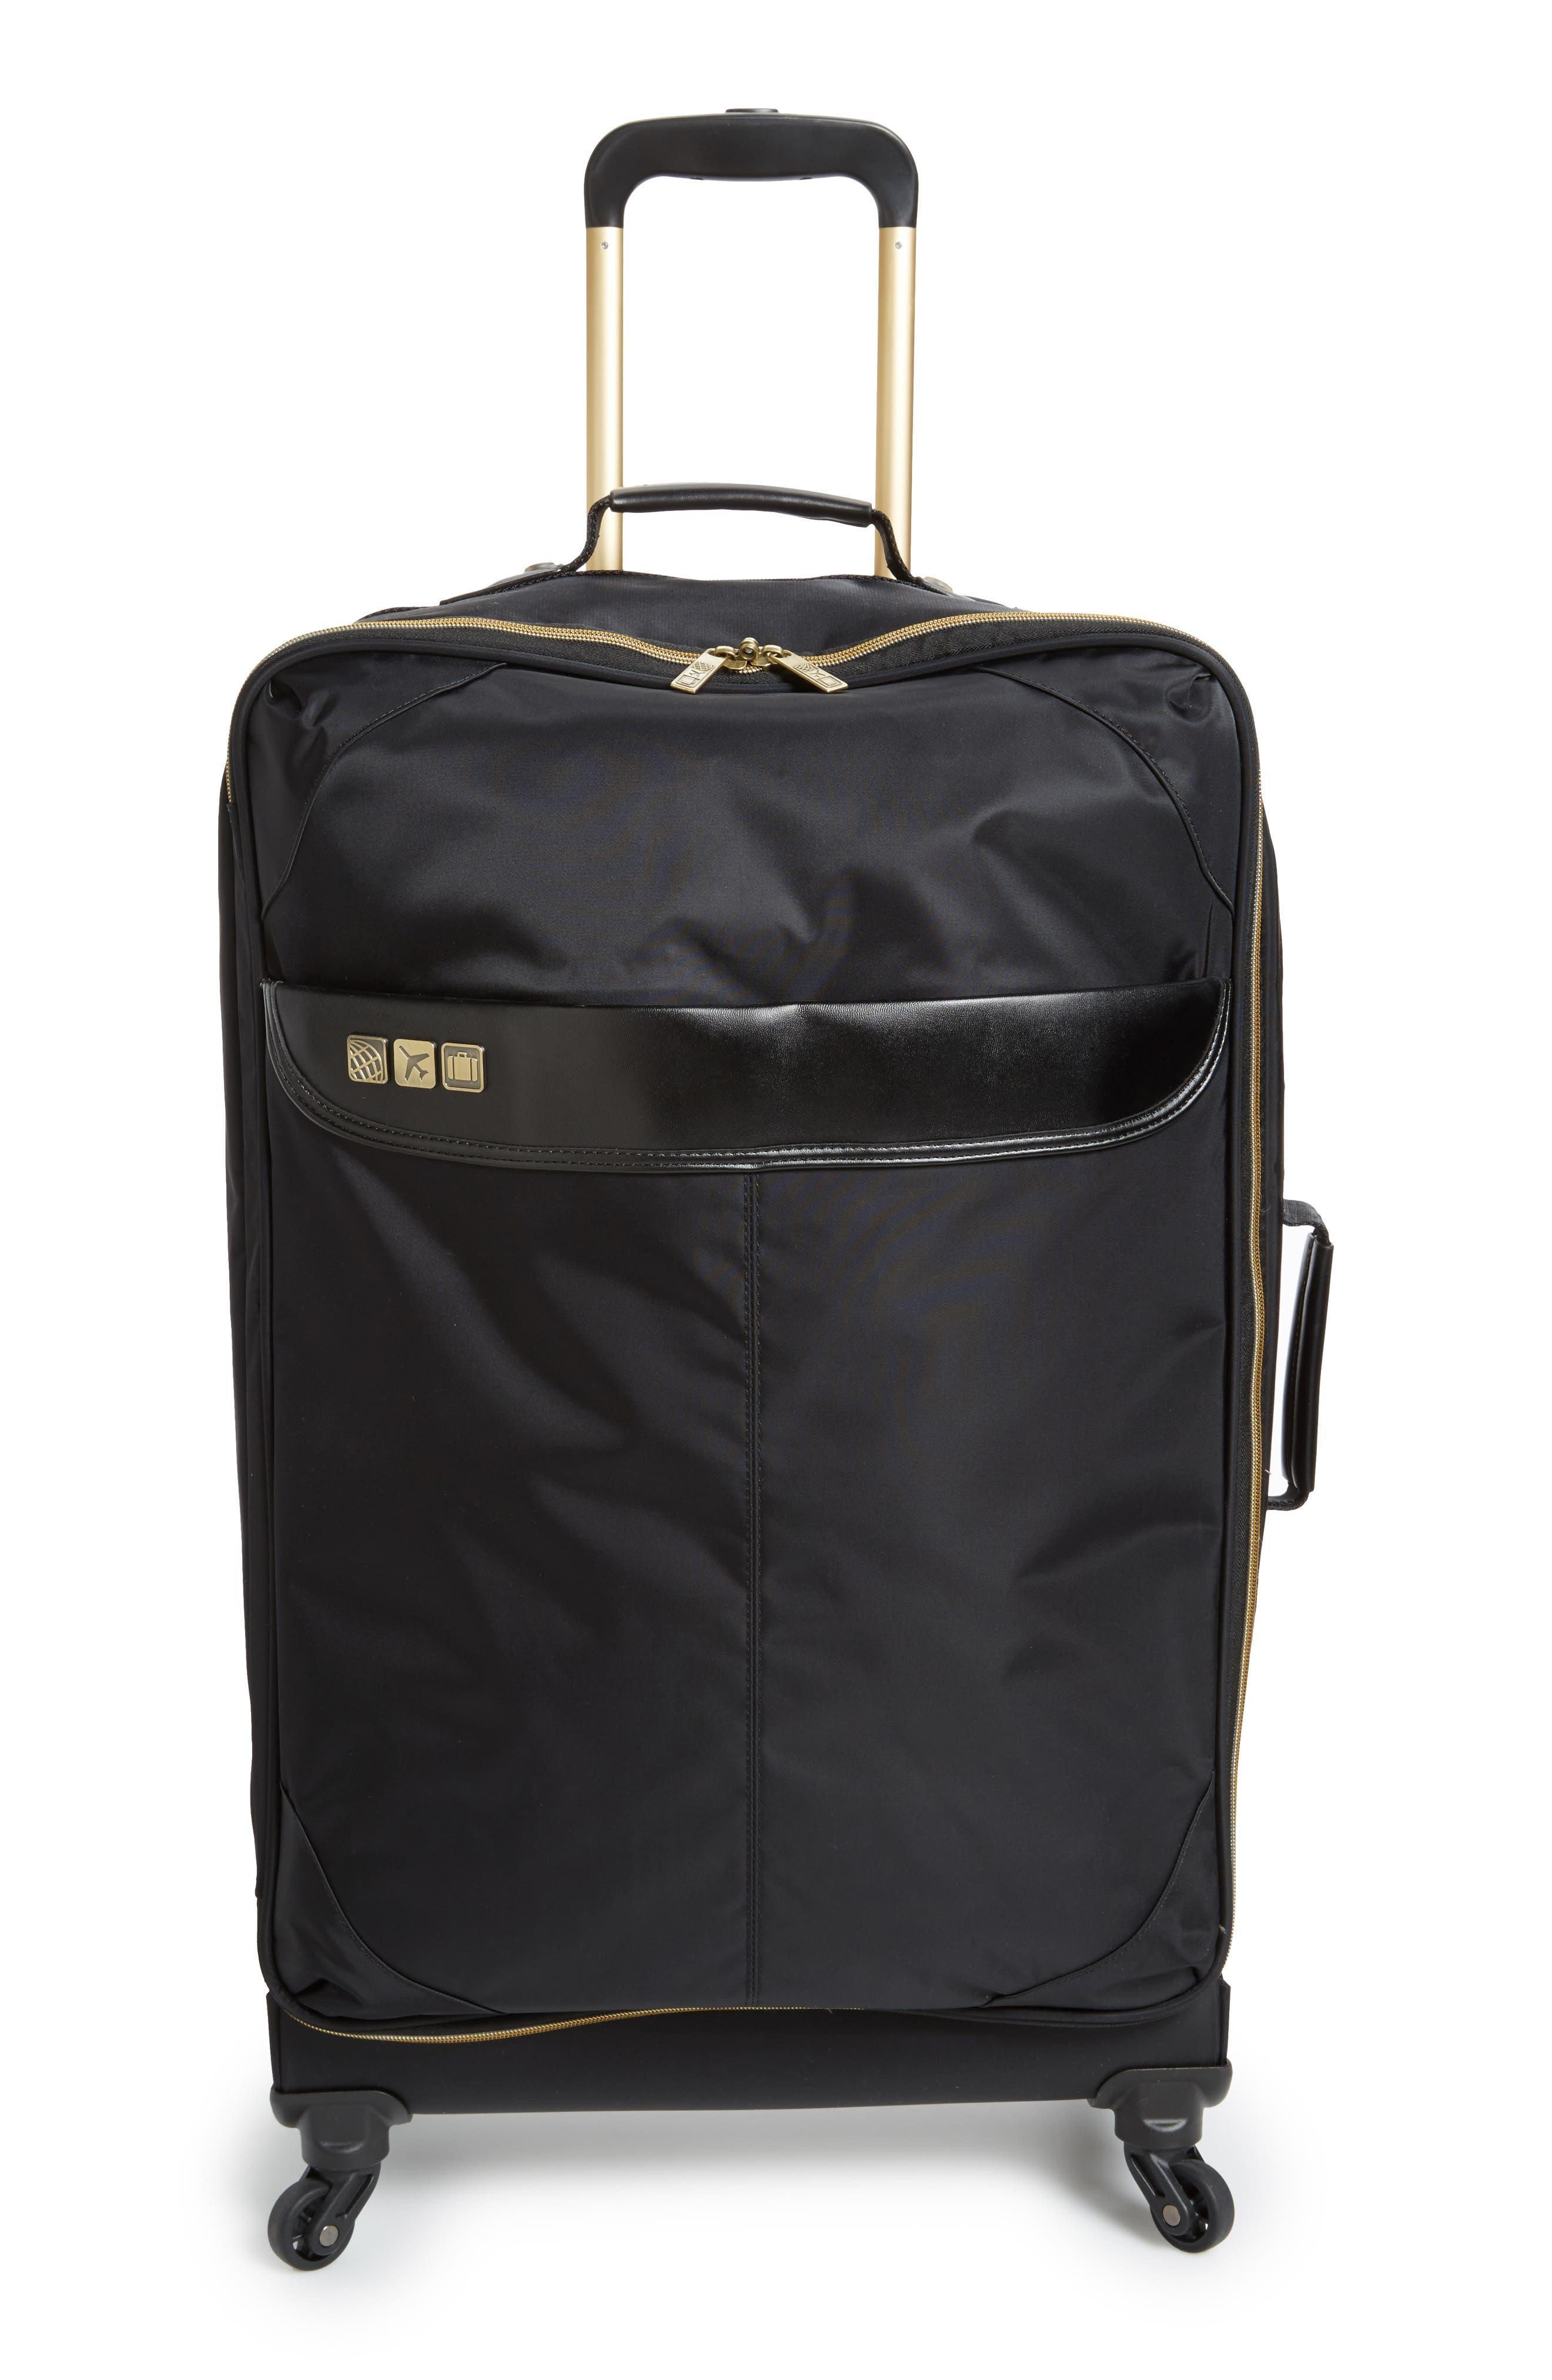 Flight 001 Avionette 26 Inch Rolling Suitcase